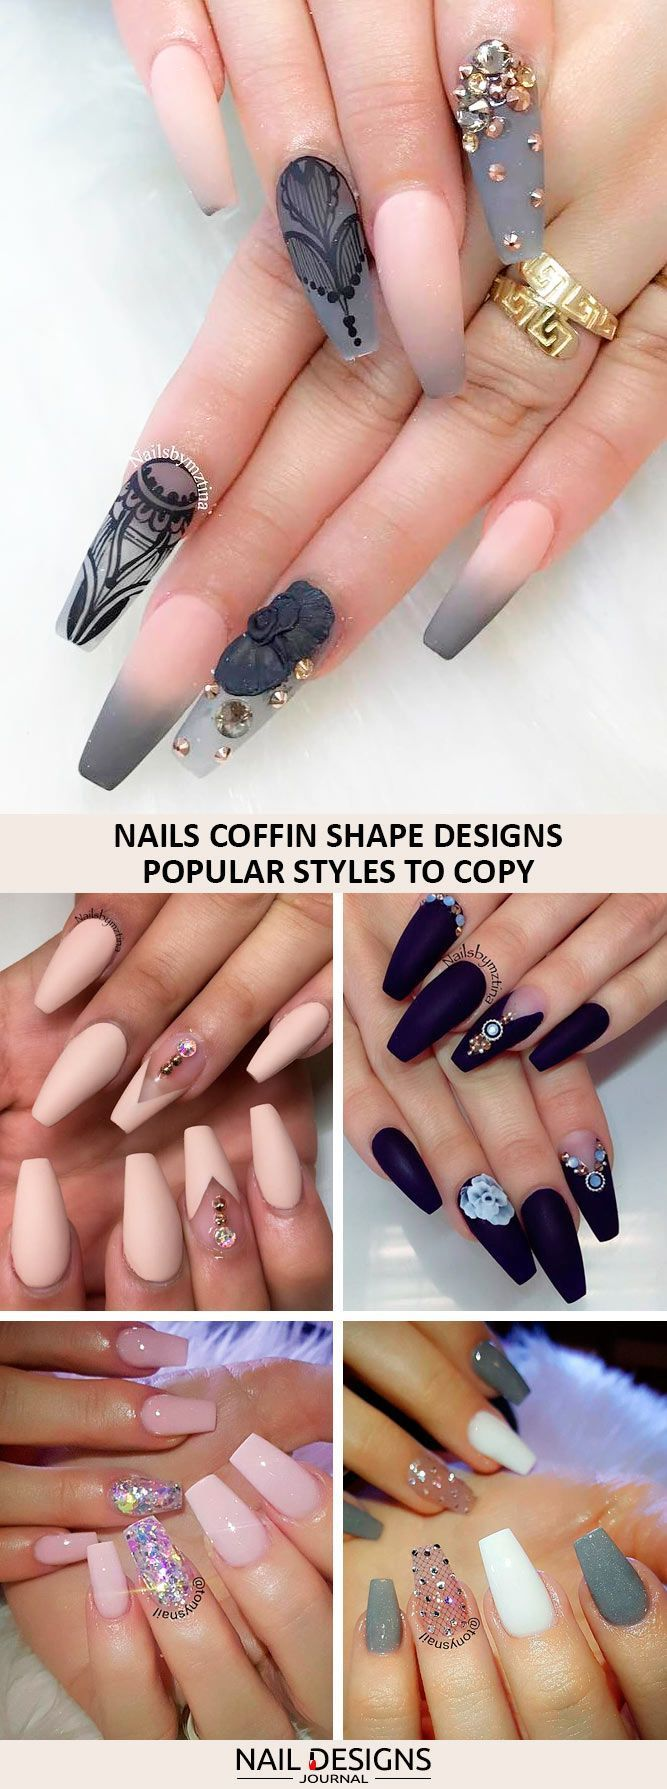 81 best Nails | Beauty images on Pinterest | Nail scissors, Nail art ...